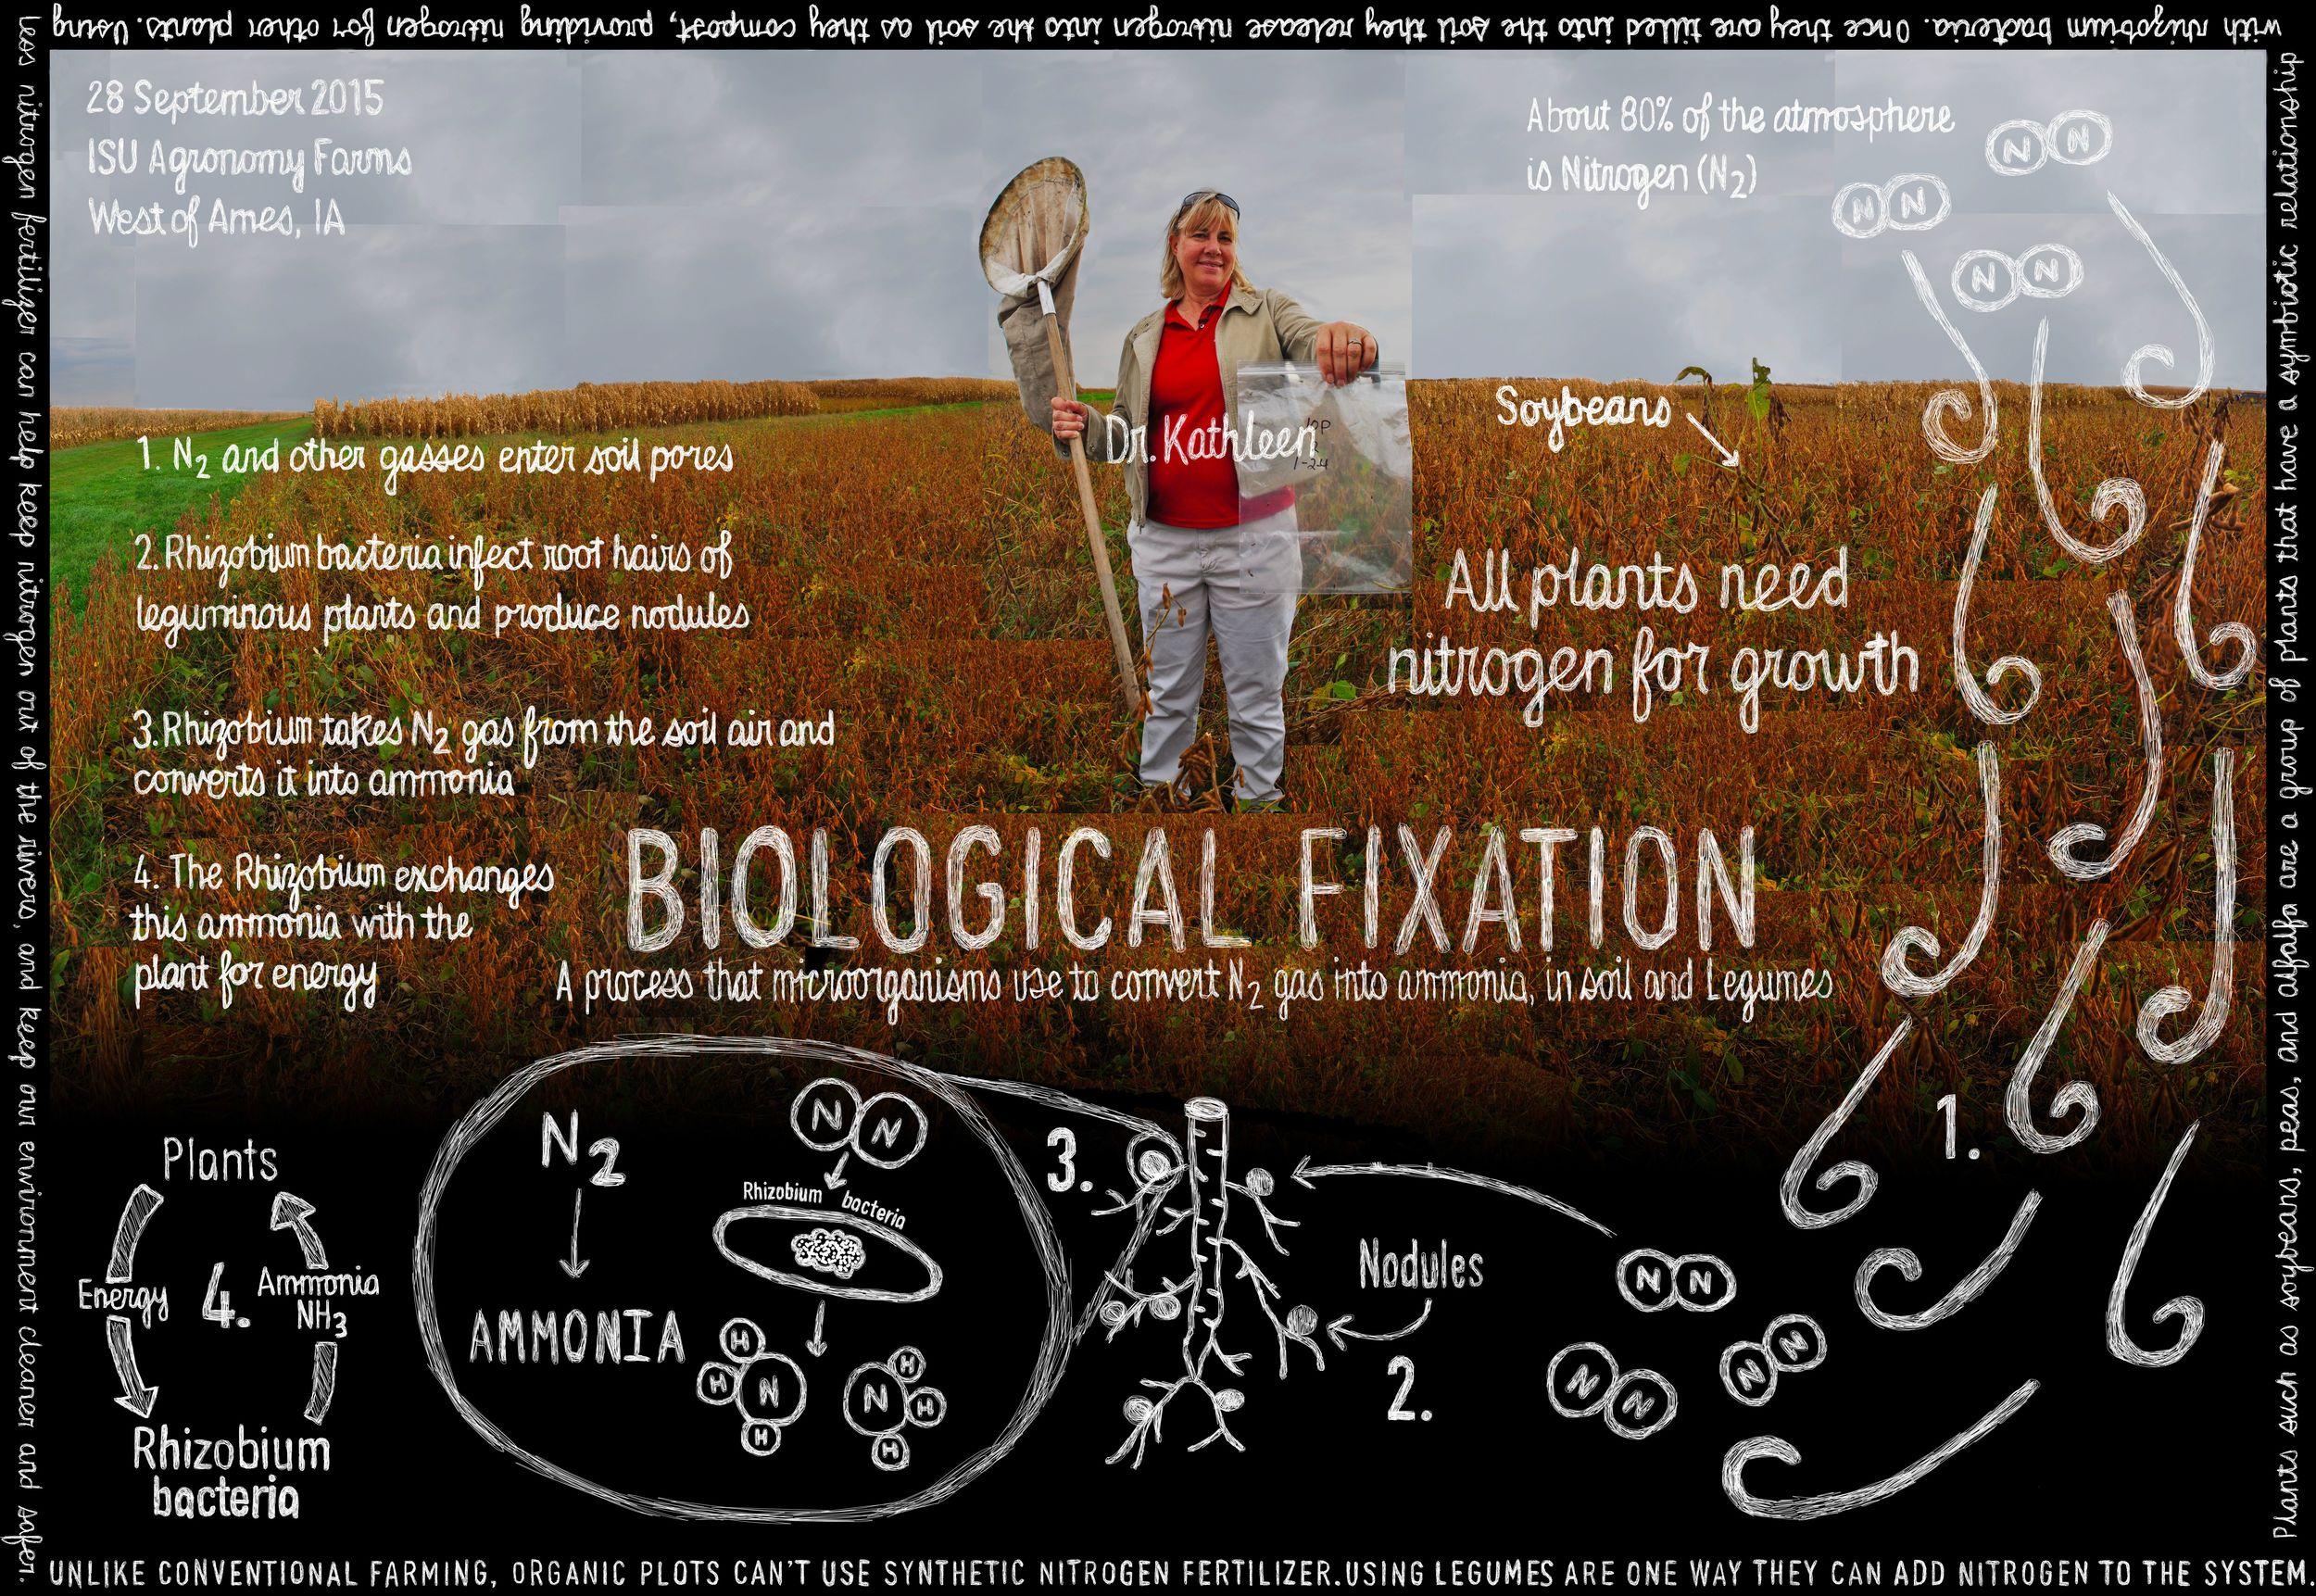 PL_Ames_BIOLOGICALFIXATION_small.jpg